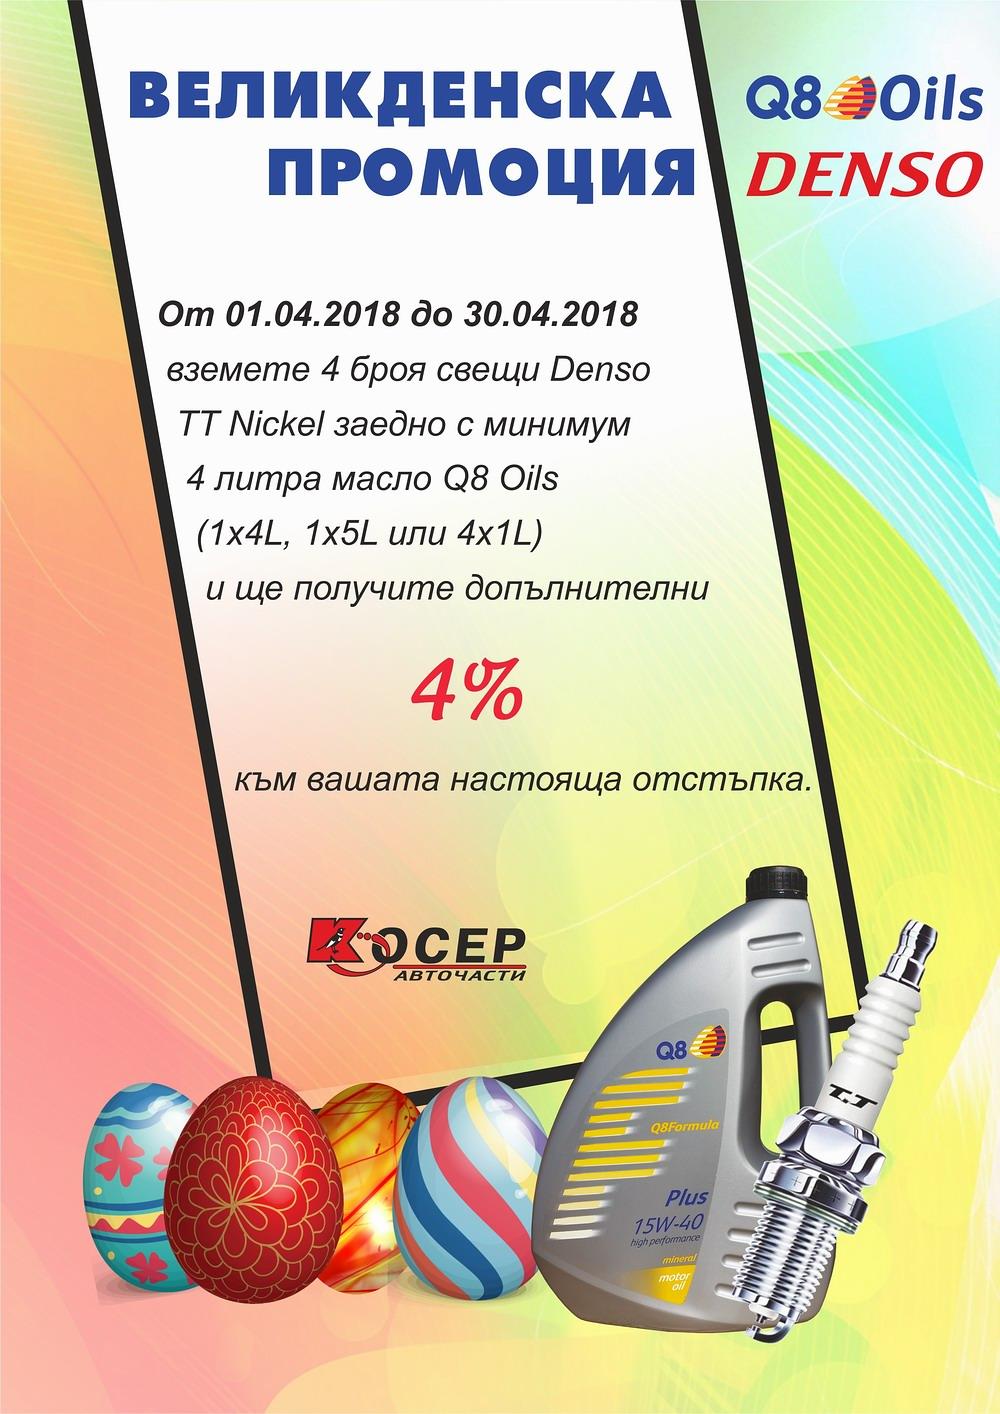 Великденска промоция Q8 + Denso, 01.04.2018 - 30.04.2018